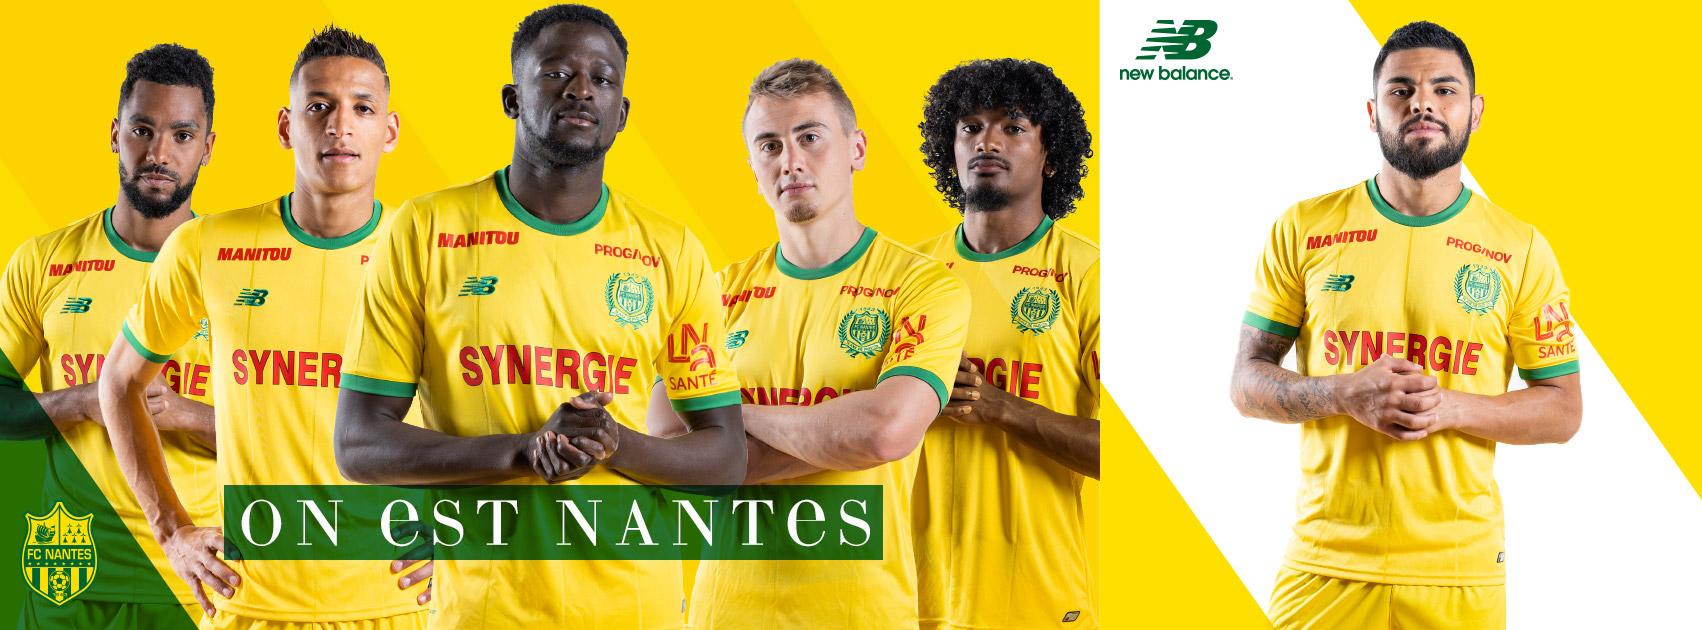 officiel FC Site officiel FC Nantes Nantes Site FC b6yfgY7